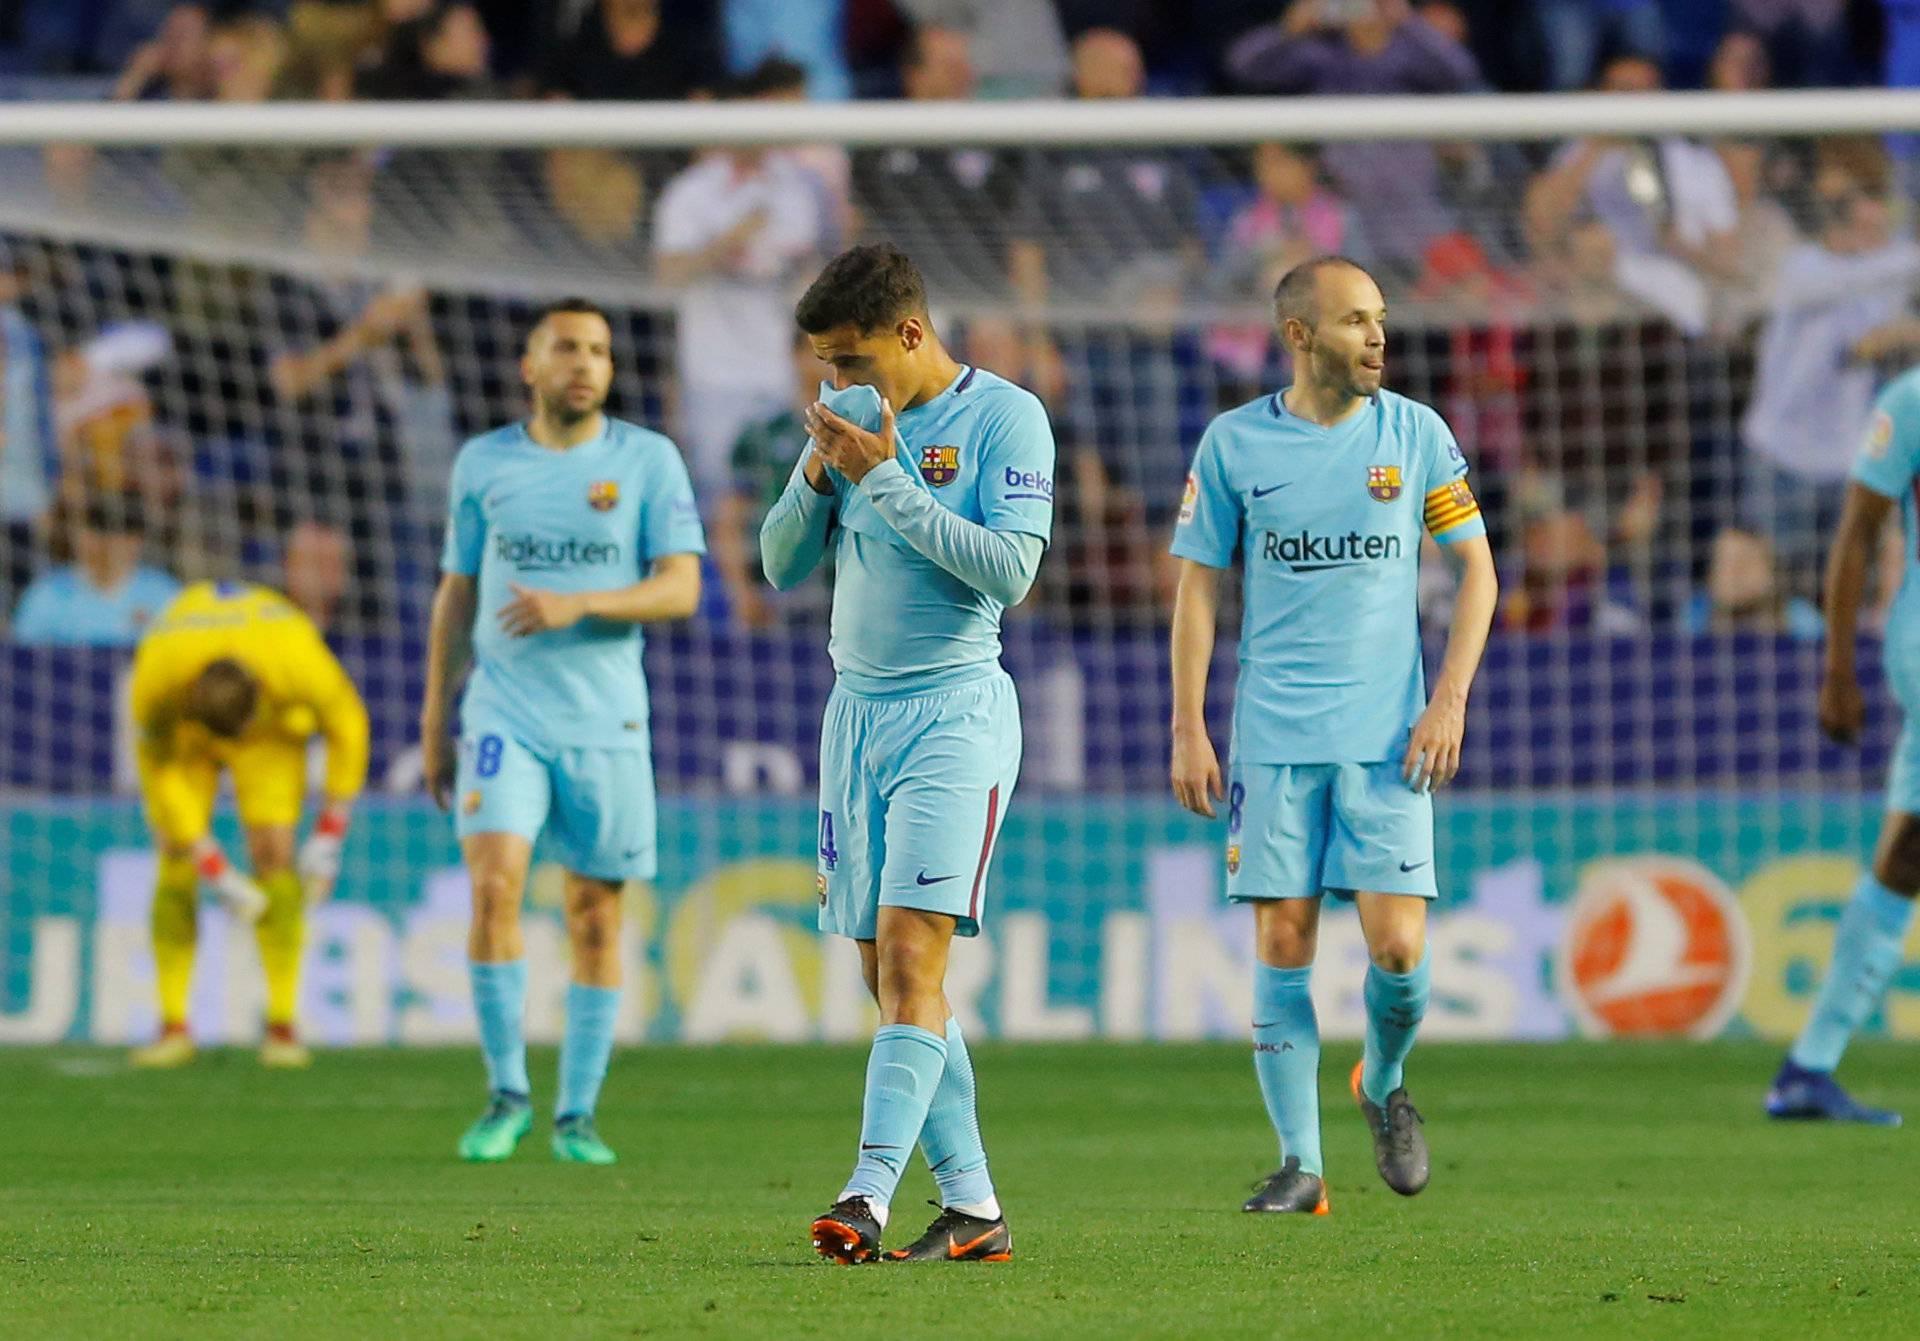 La Liga Santander - Levante vs FC Barcelona